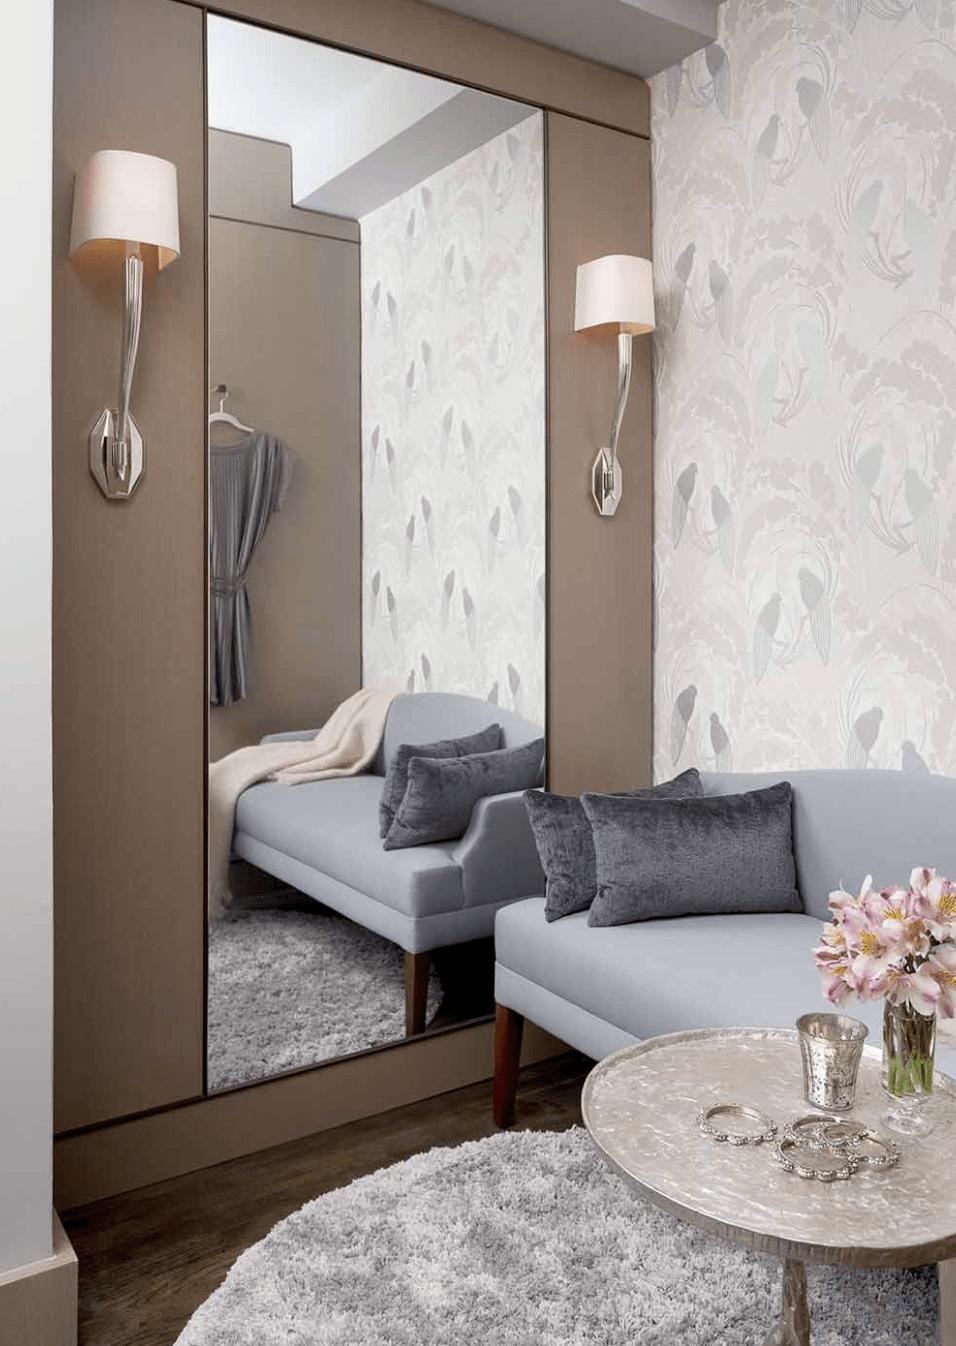 darci hether pied-a-terre upper west side modern classic elegance bespoke wallpaper sconces holly hunt sofa